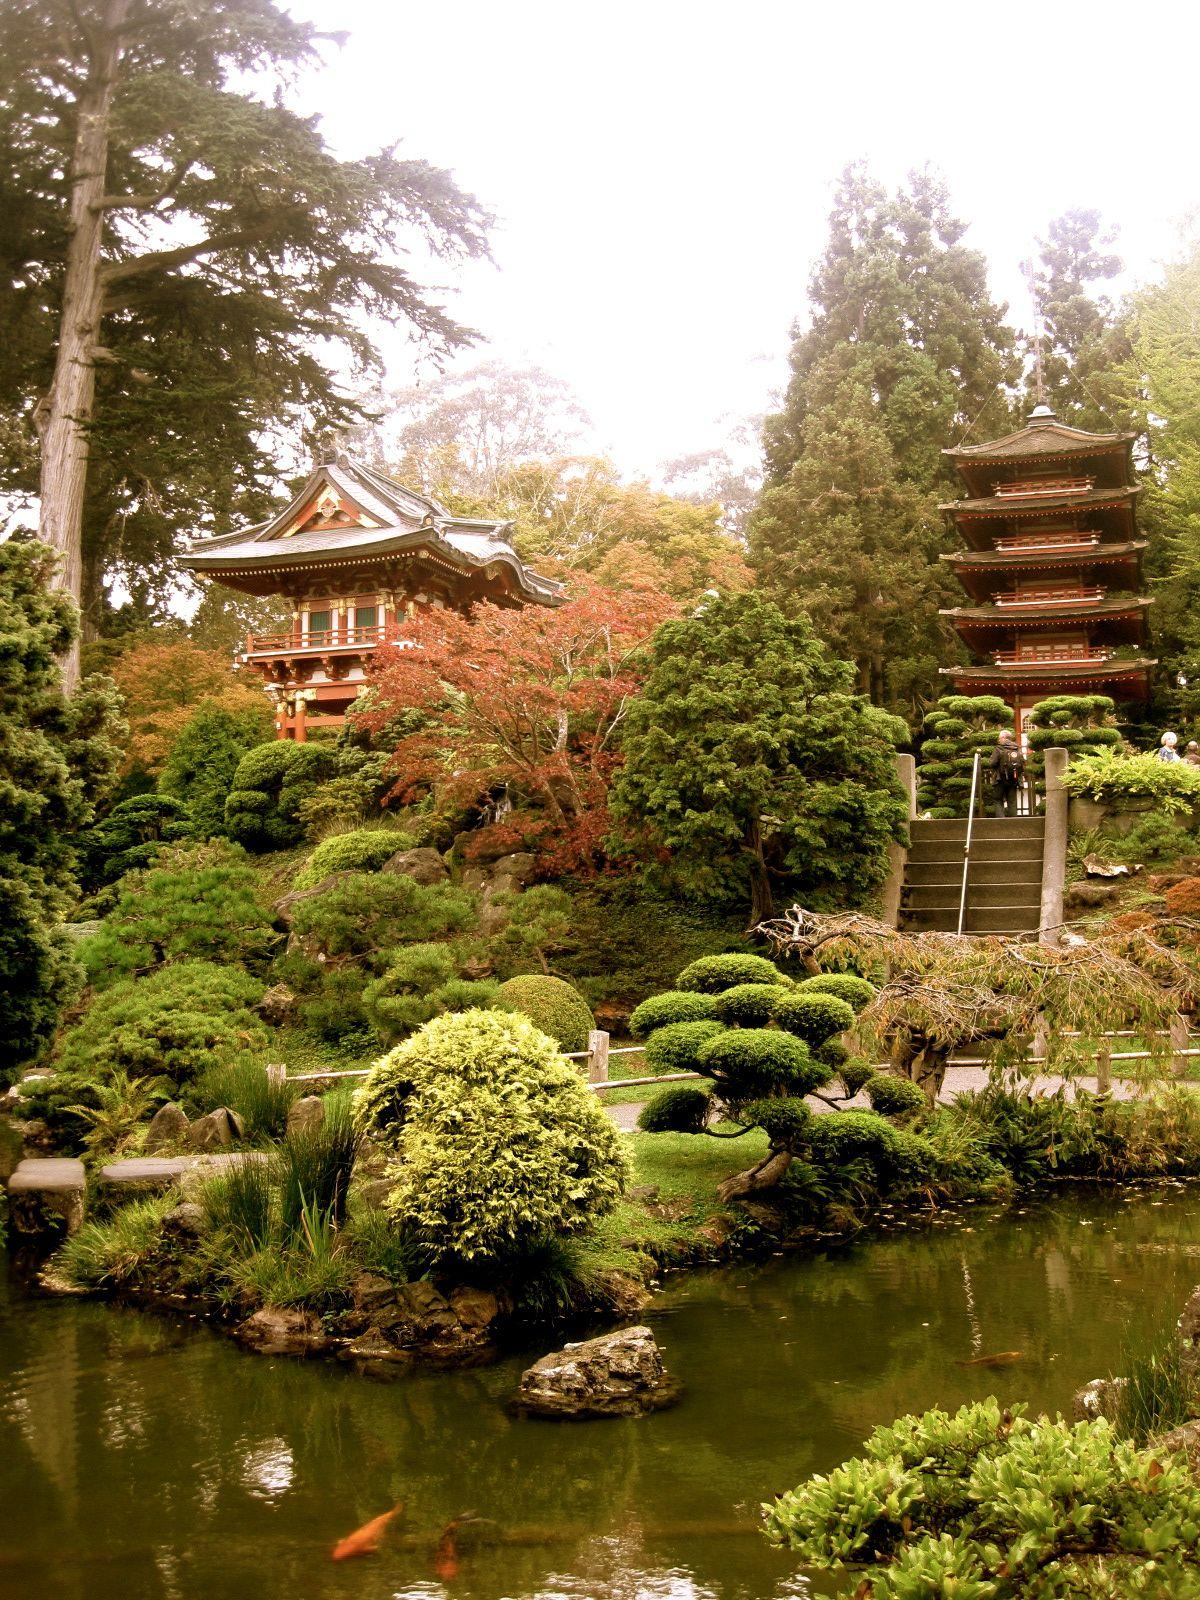 View from the tea house lotus zen garden japanese